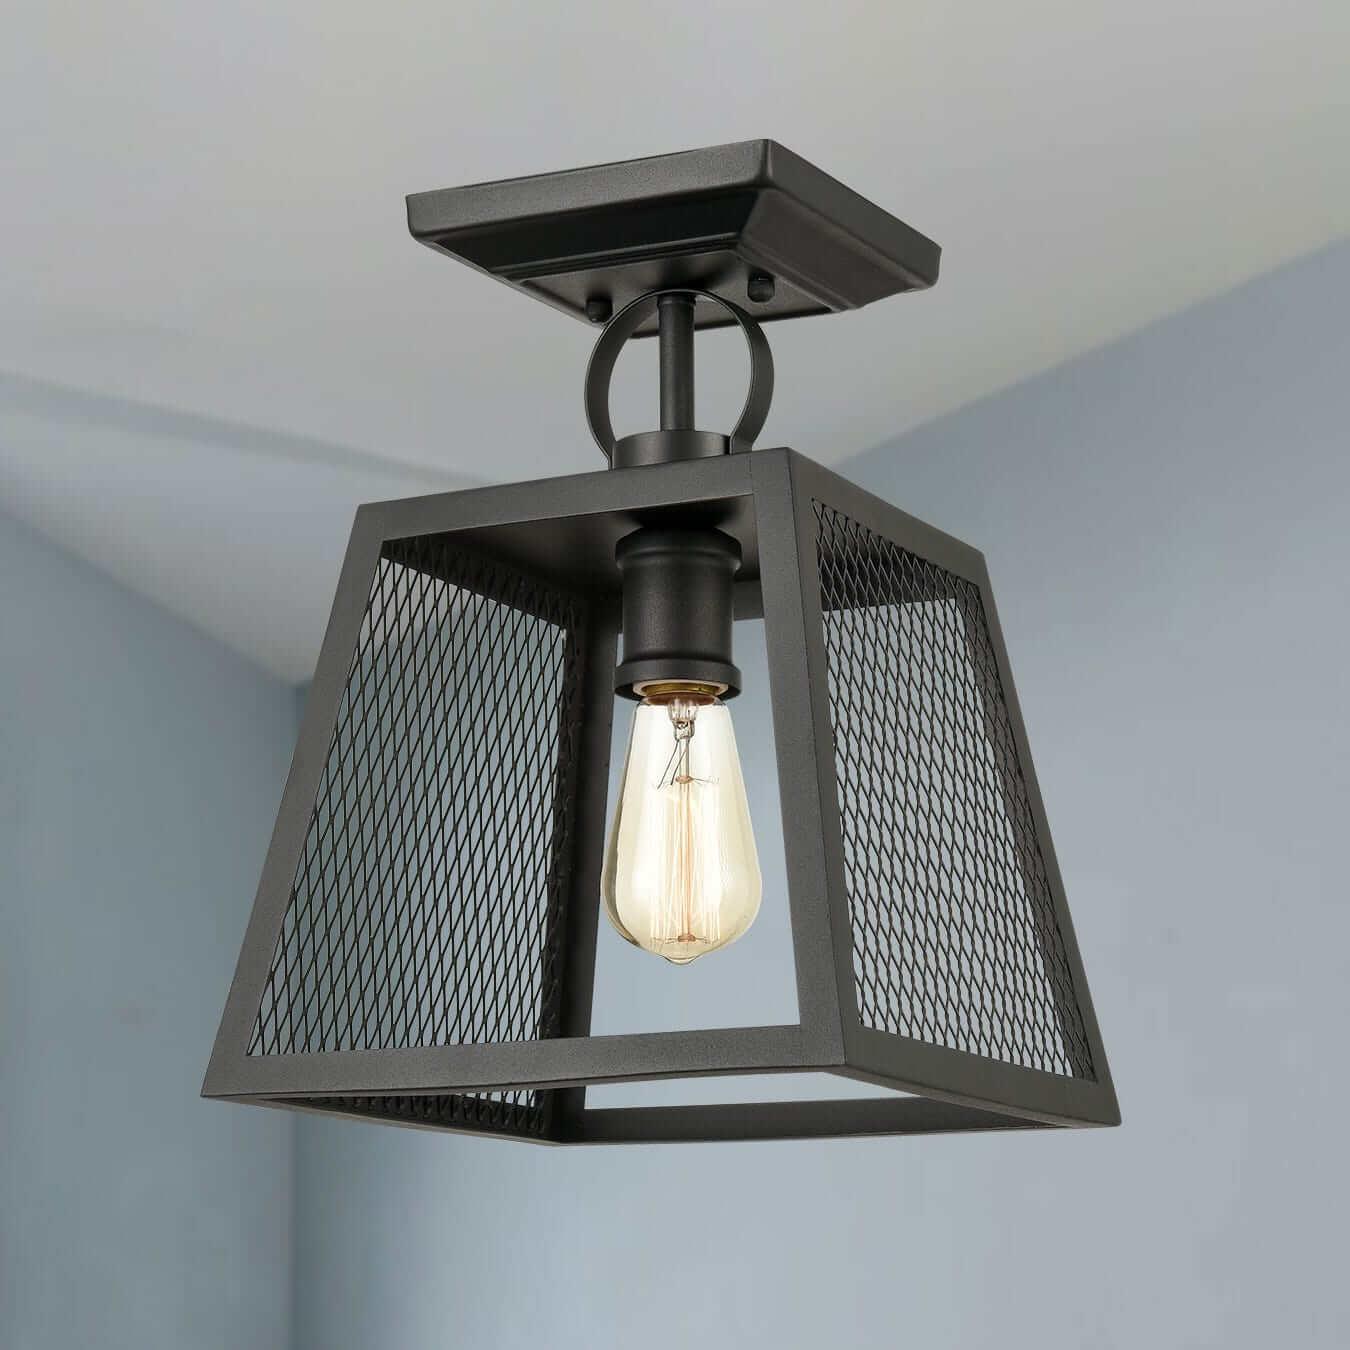 Industrial Matte Black Semi Flush Mount Ceiling LightS Foyer Ceiling Fixture